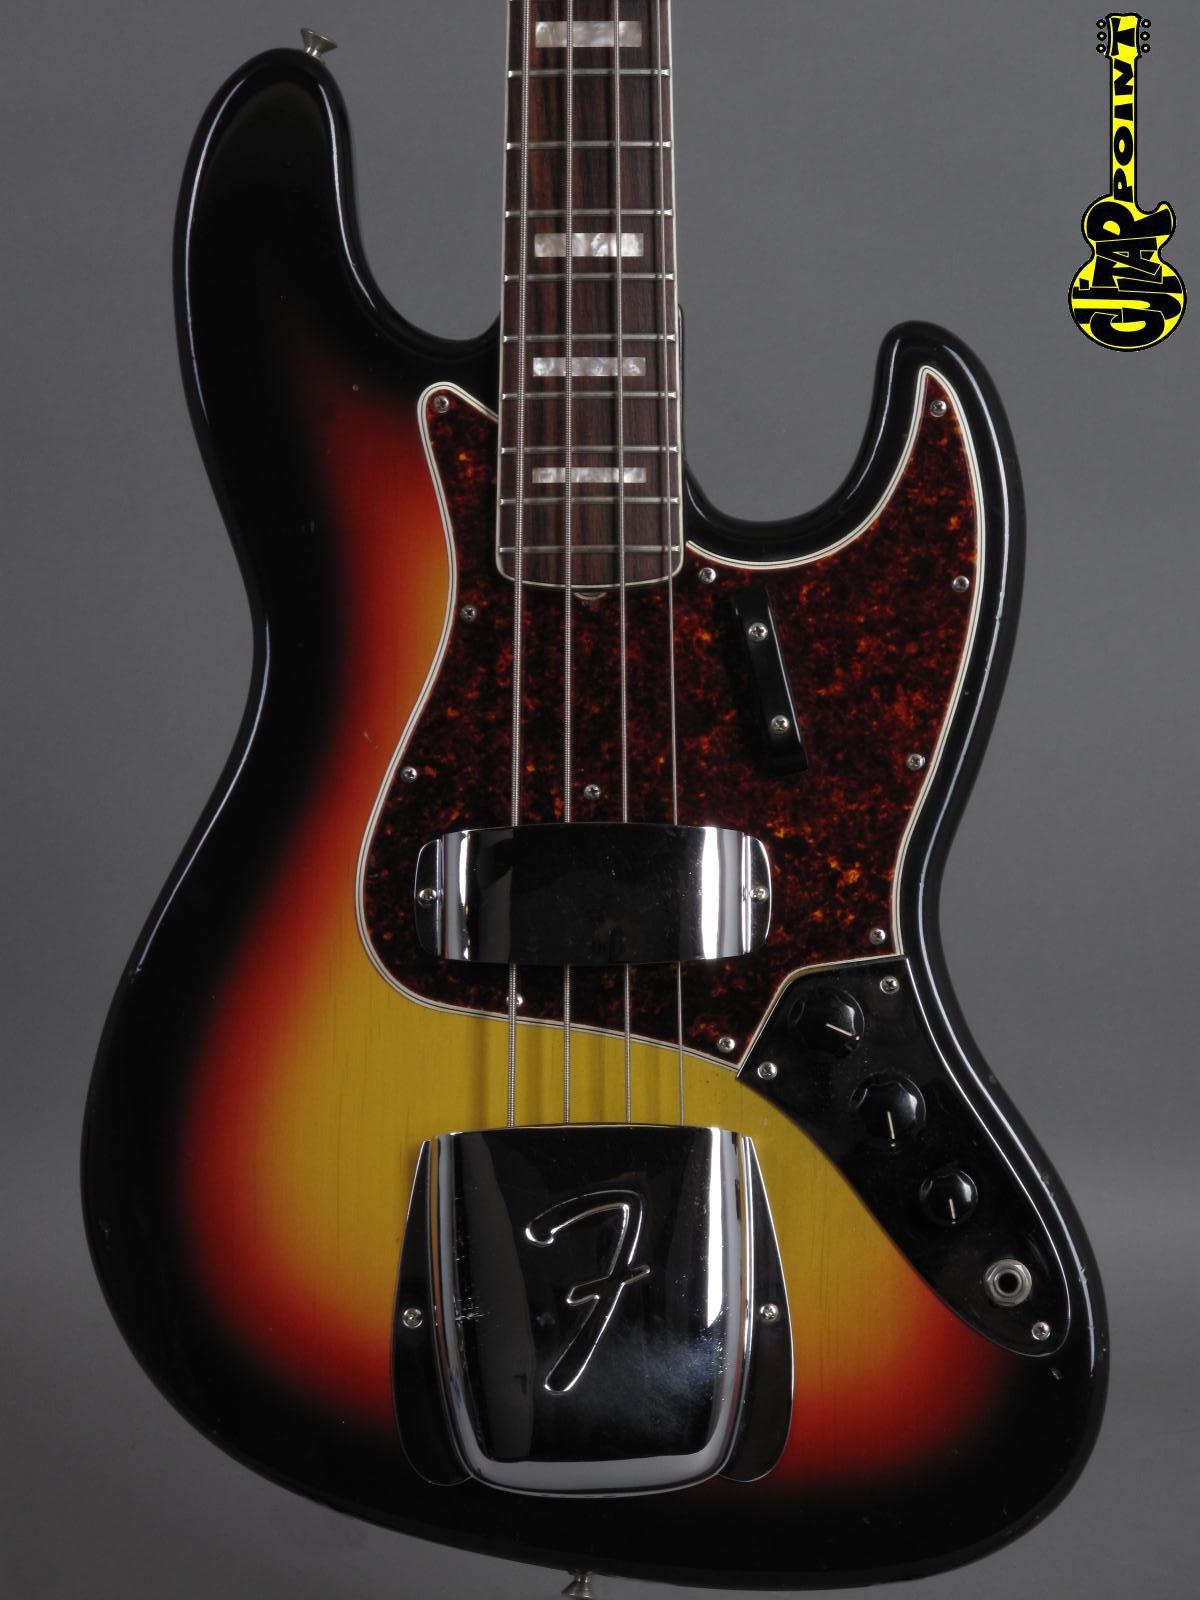 1966 Fender Jazz Bass - 3-tone Sunburst